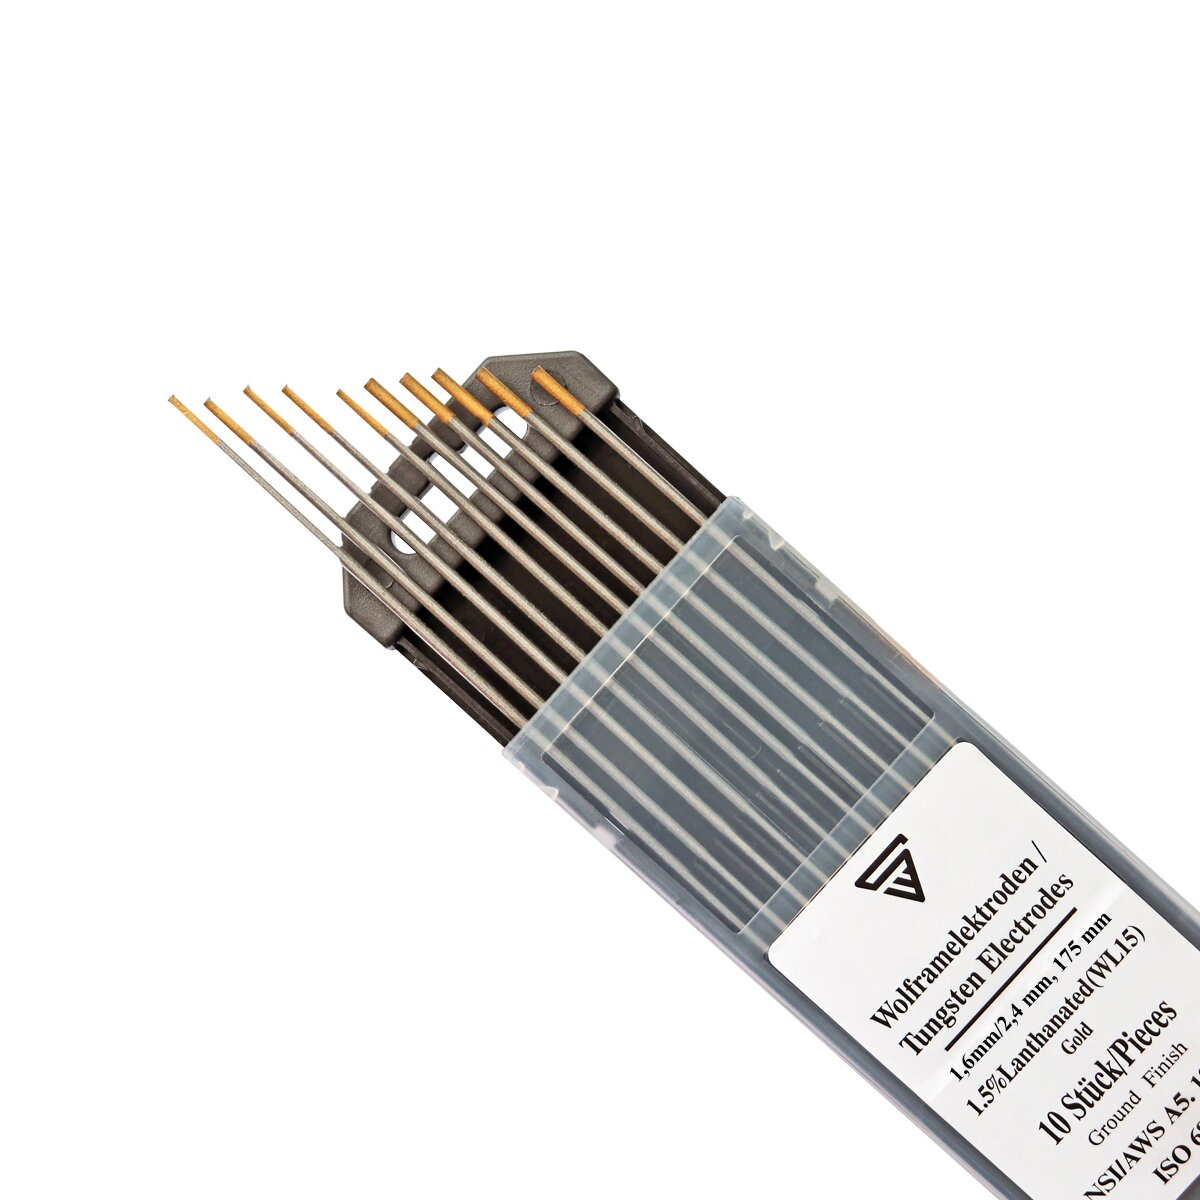 Forever Speed Wolfram Elektroede Nadel WL-15 Ø2,4 x 175 mm WIG Schweiß WT-15